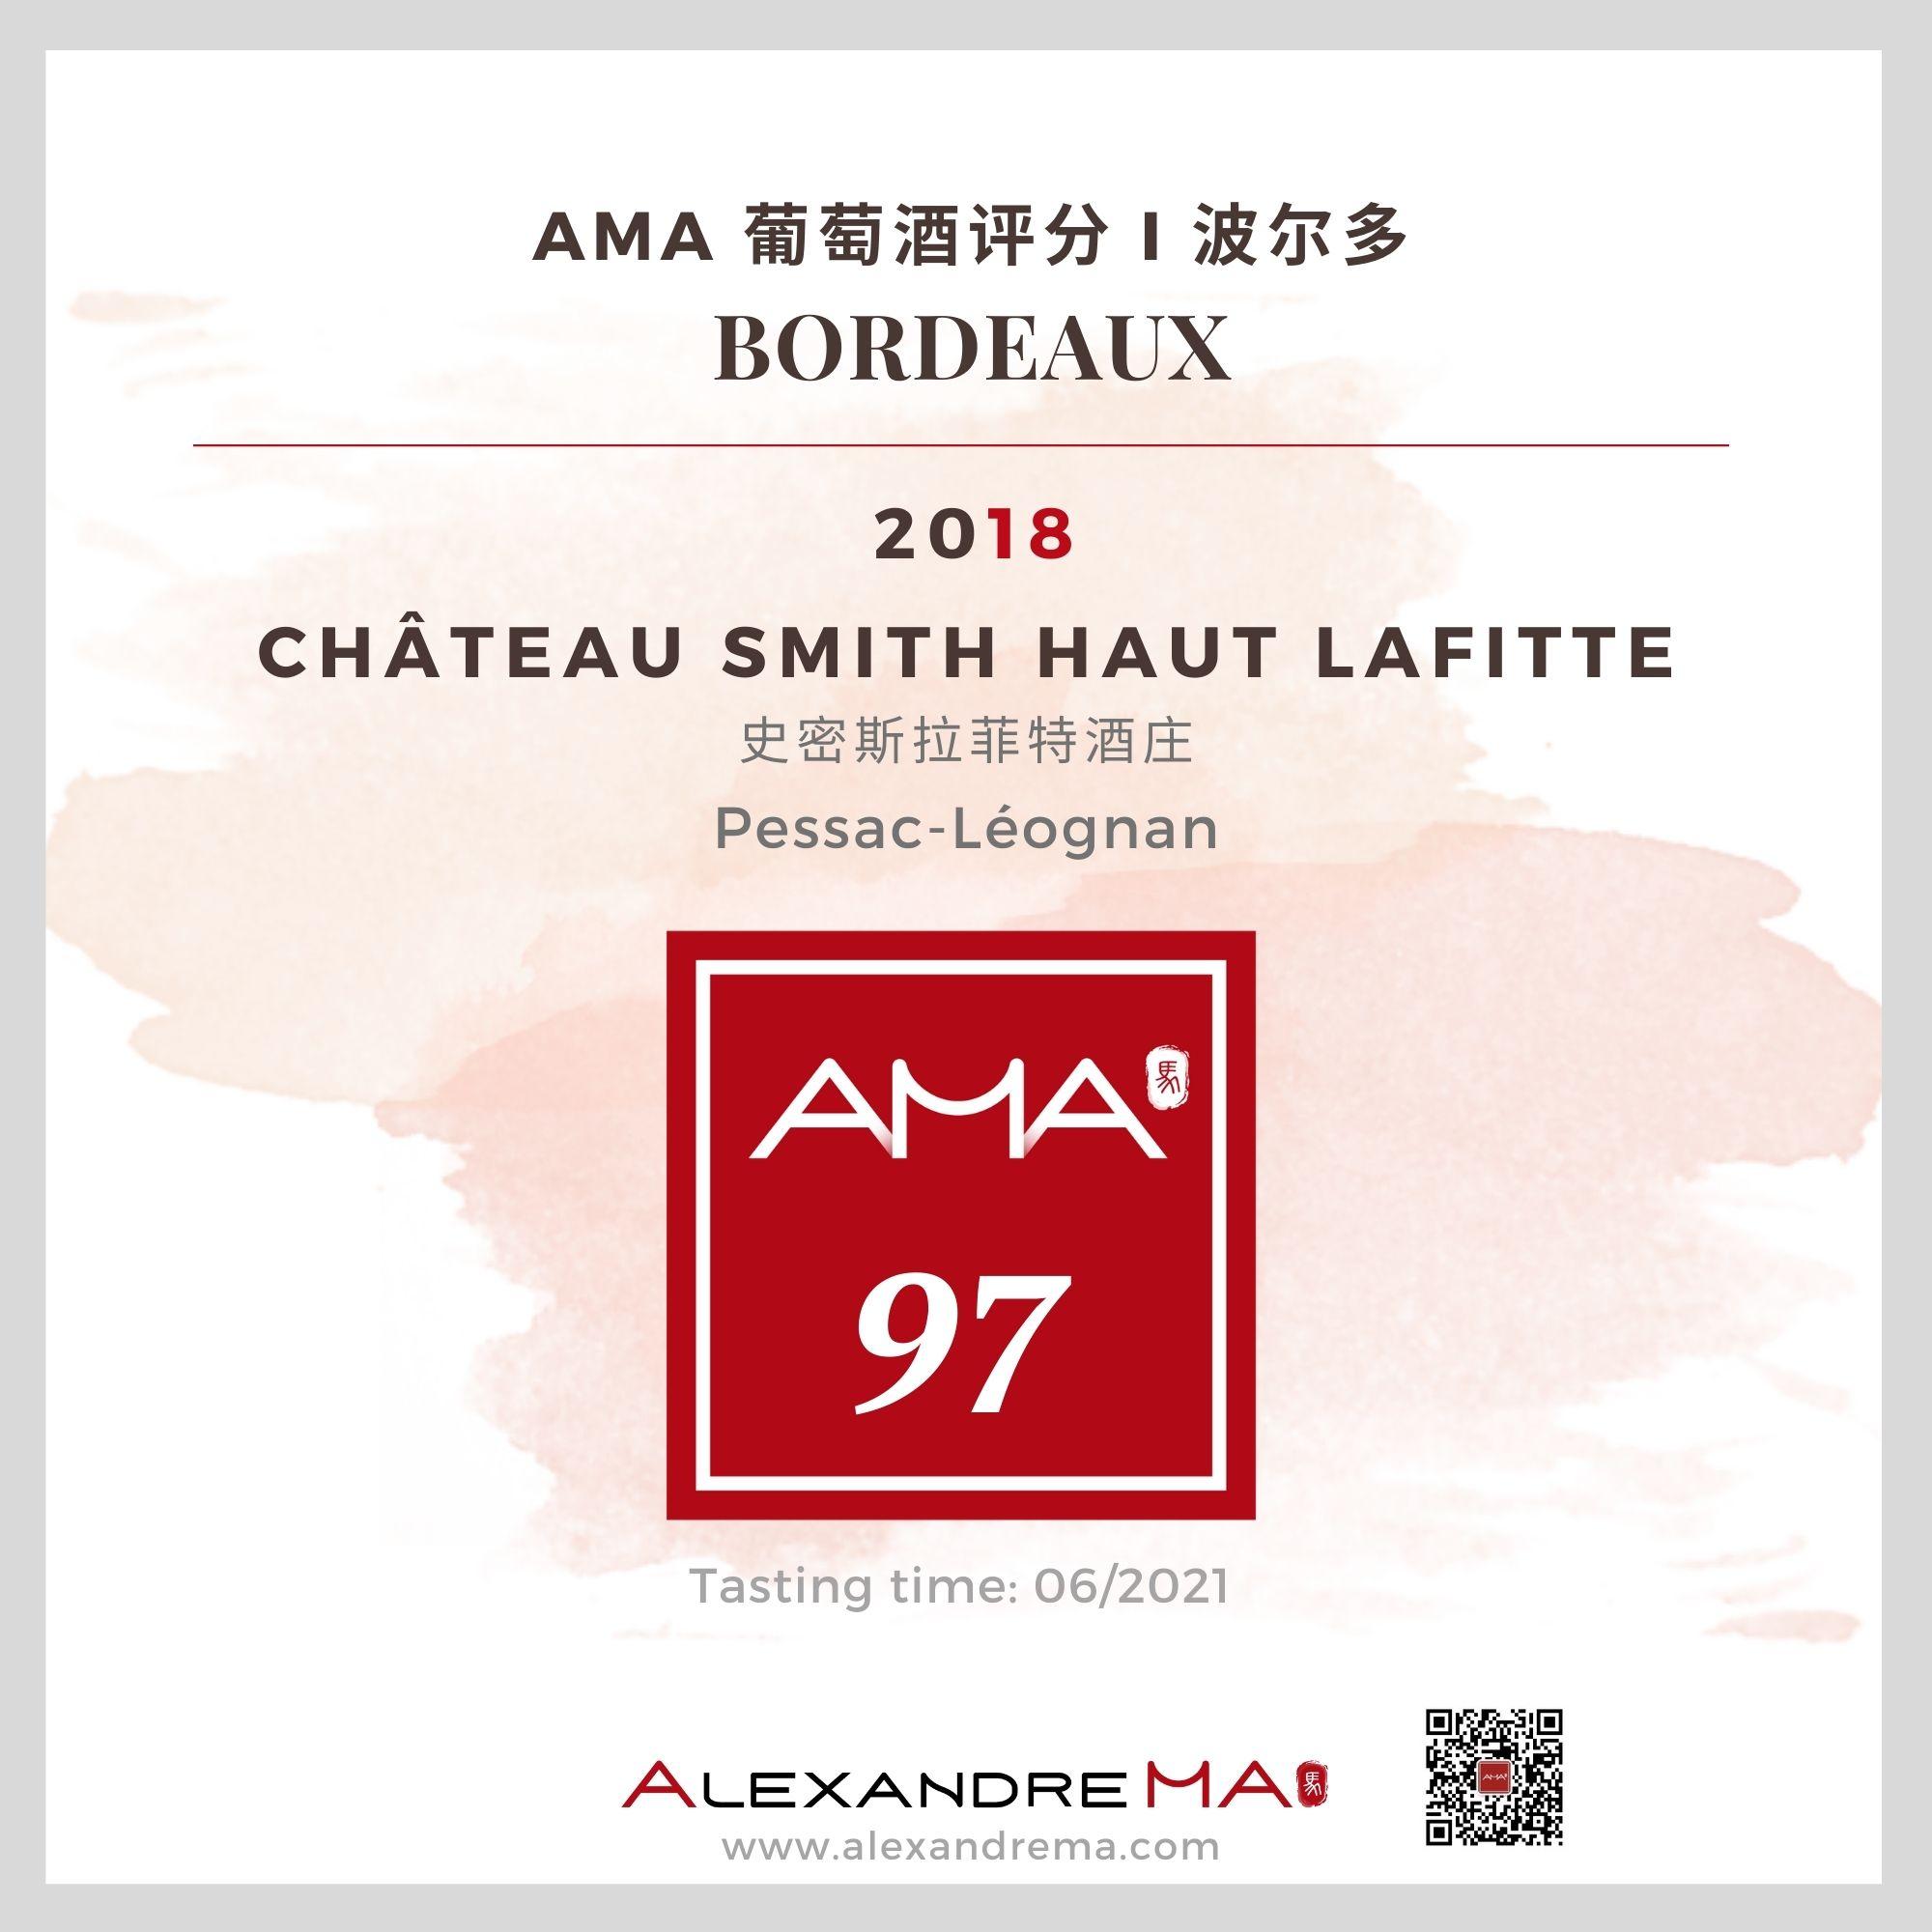 Château Smith Haut Lafitte 2018 史密斯拉菲特酒庄 - Alexandre Ma